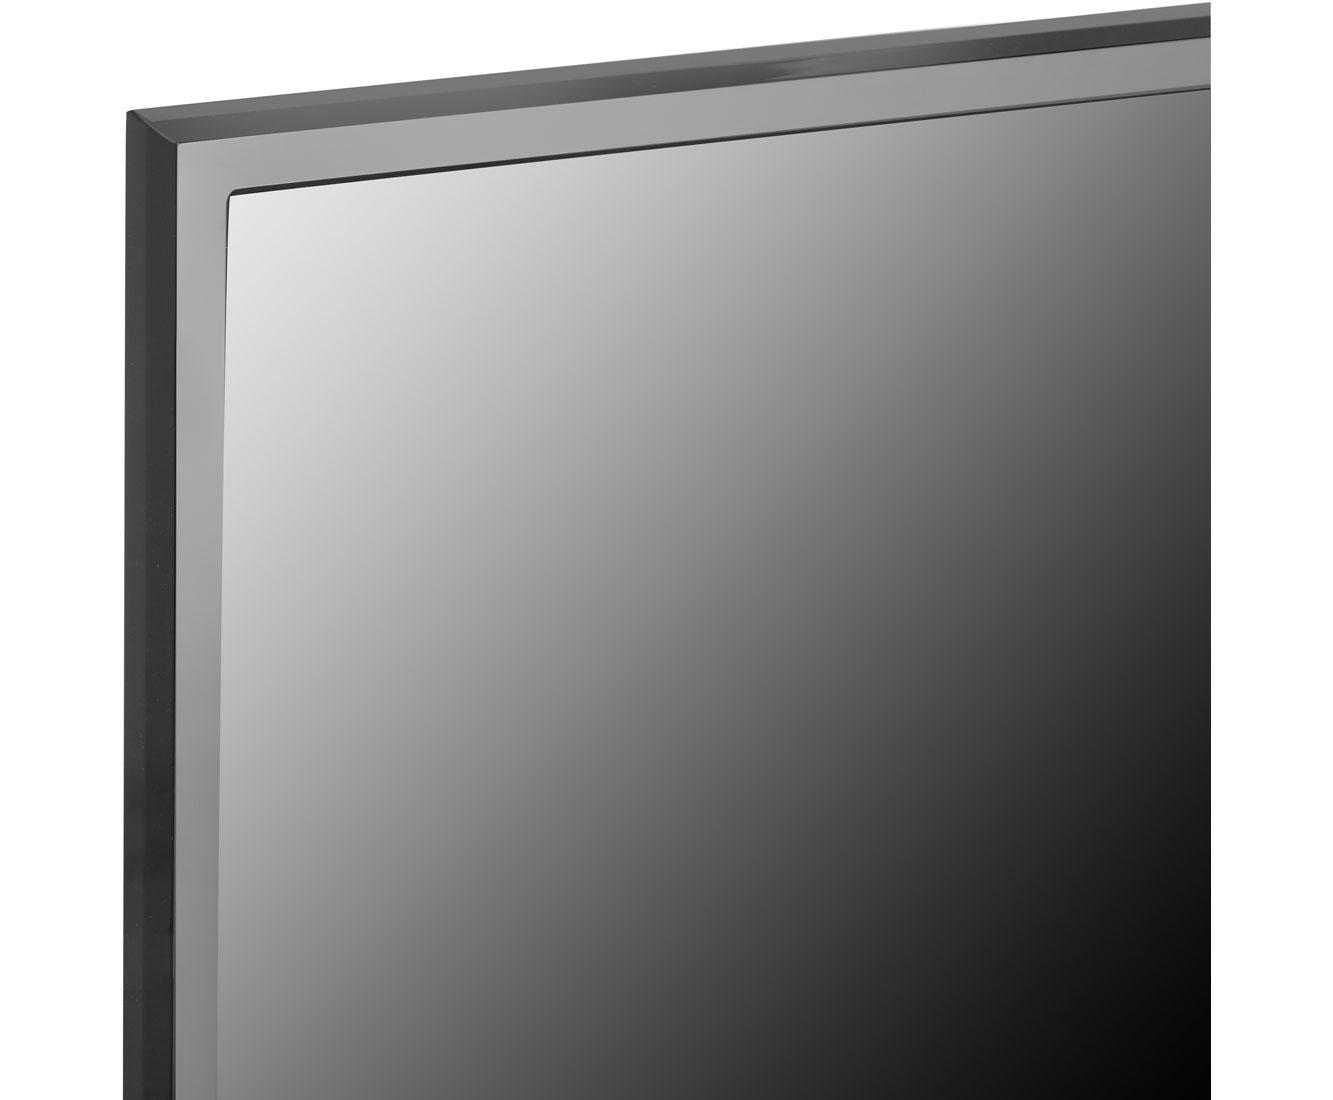 grundig 65 gub 8960 4k uhd led fernseher 164 cm 65 zoll hdr schwarz ebay. Black Bedroom Furniture Sets. Home Design Ideas